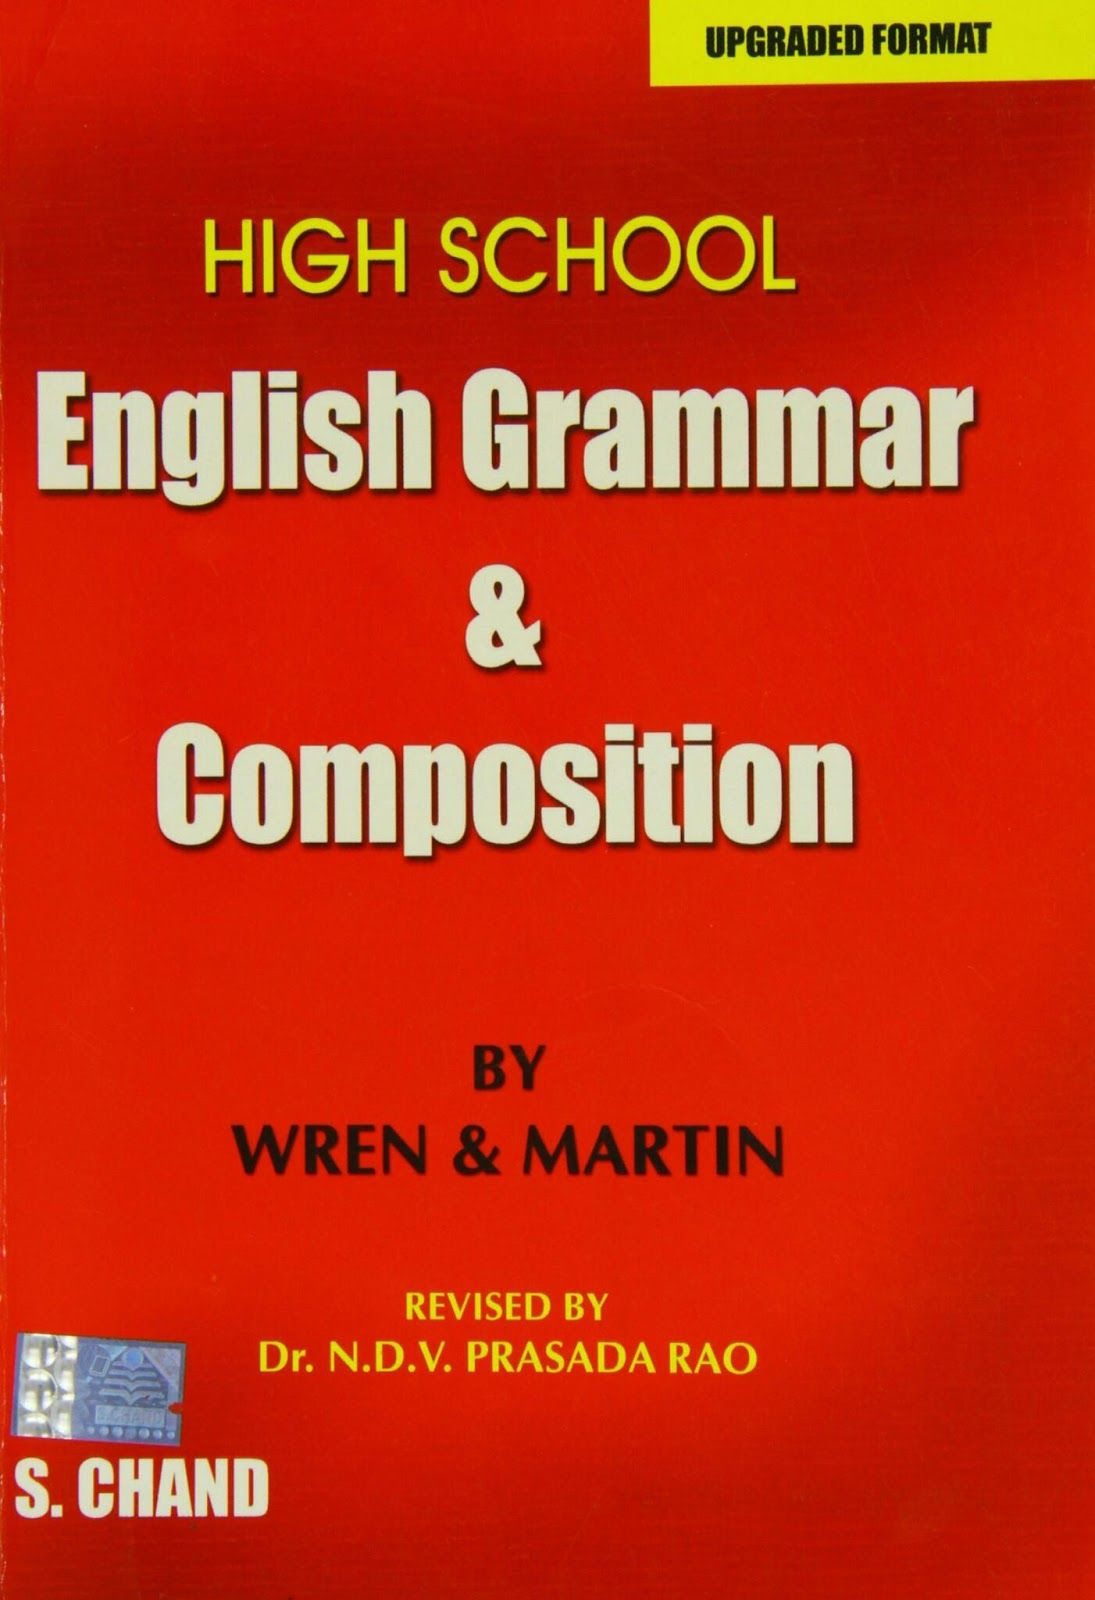 High School English Grammar Amp Composition By Wren Amp Martin